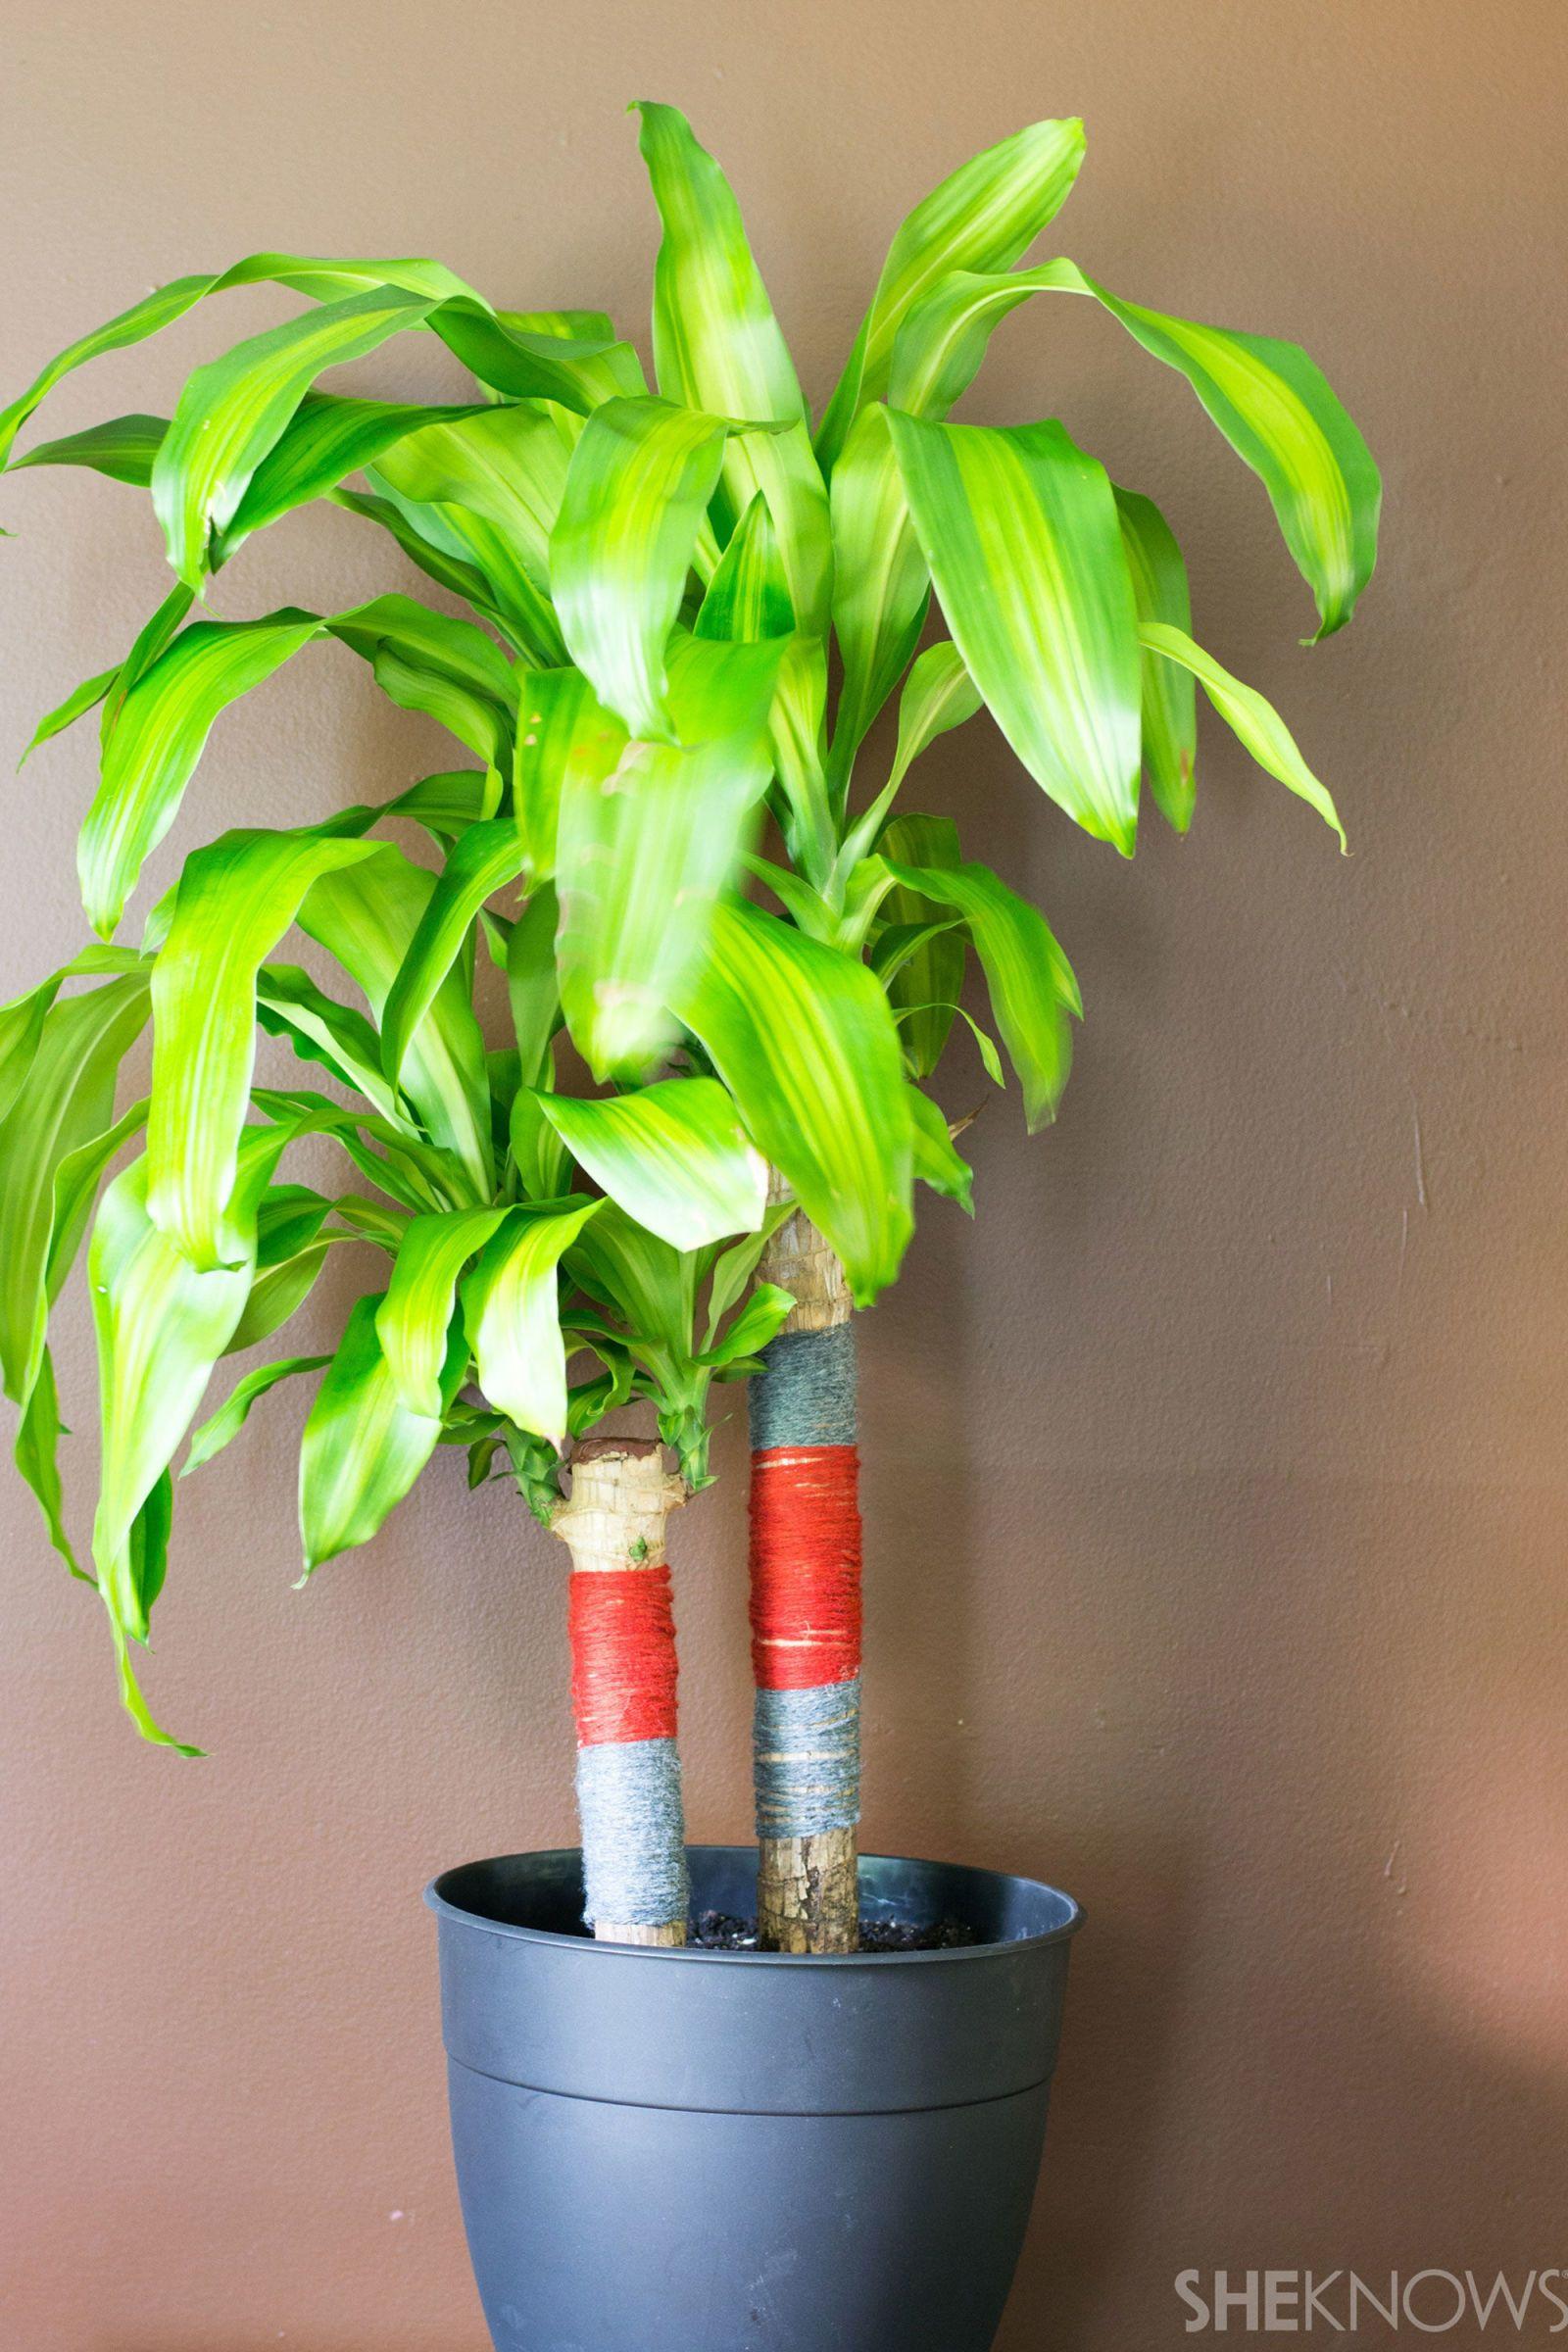 Yarn-Bombed Plant